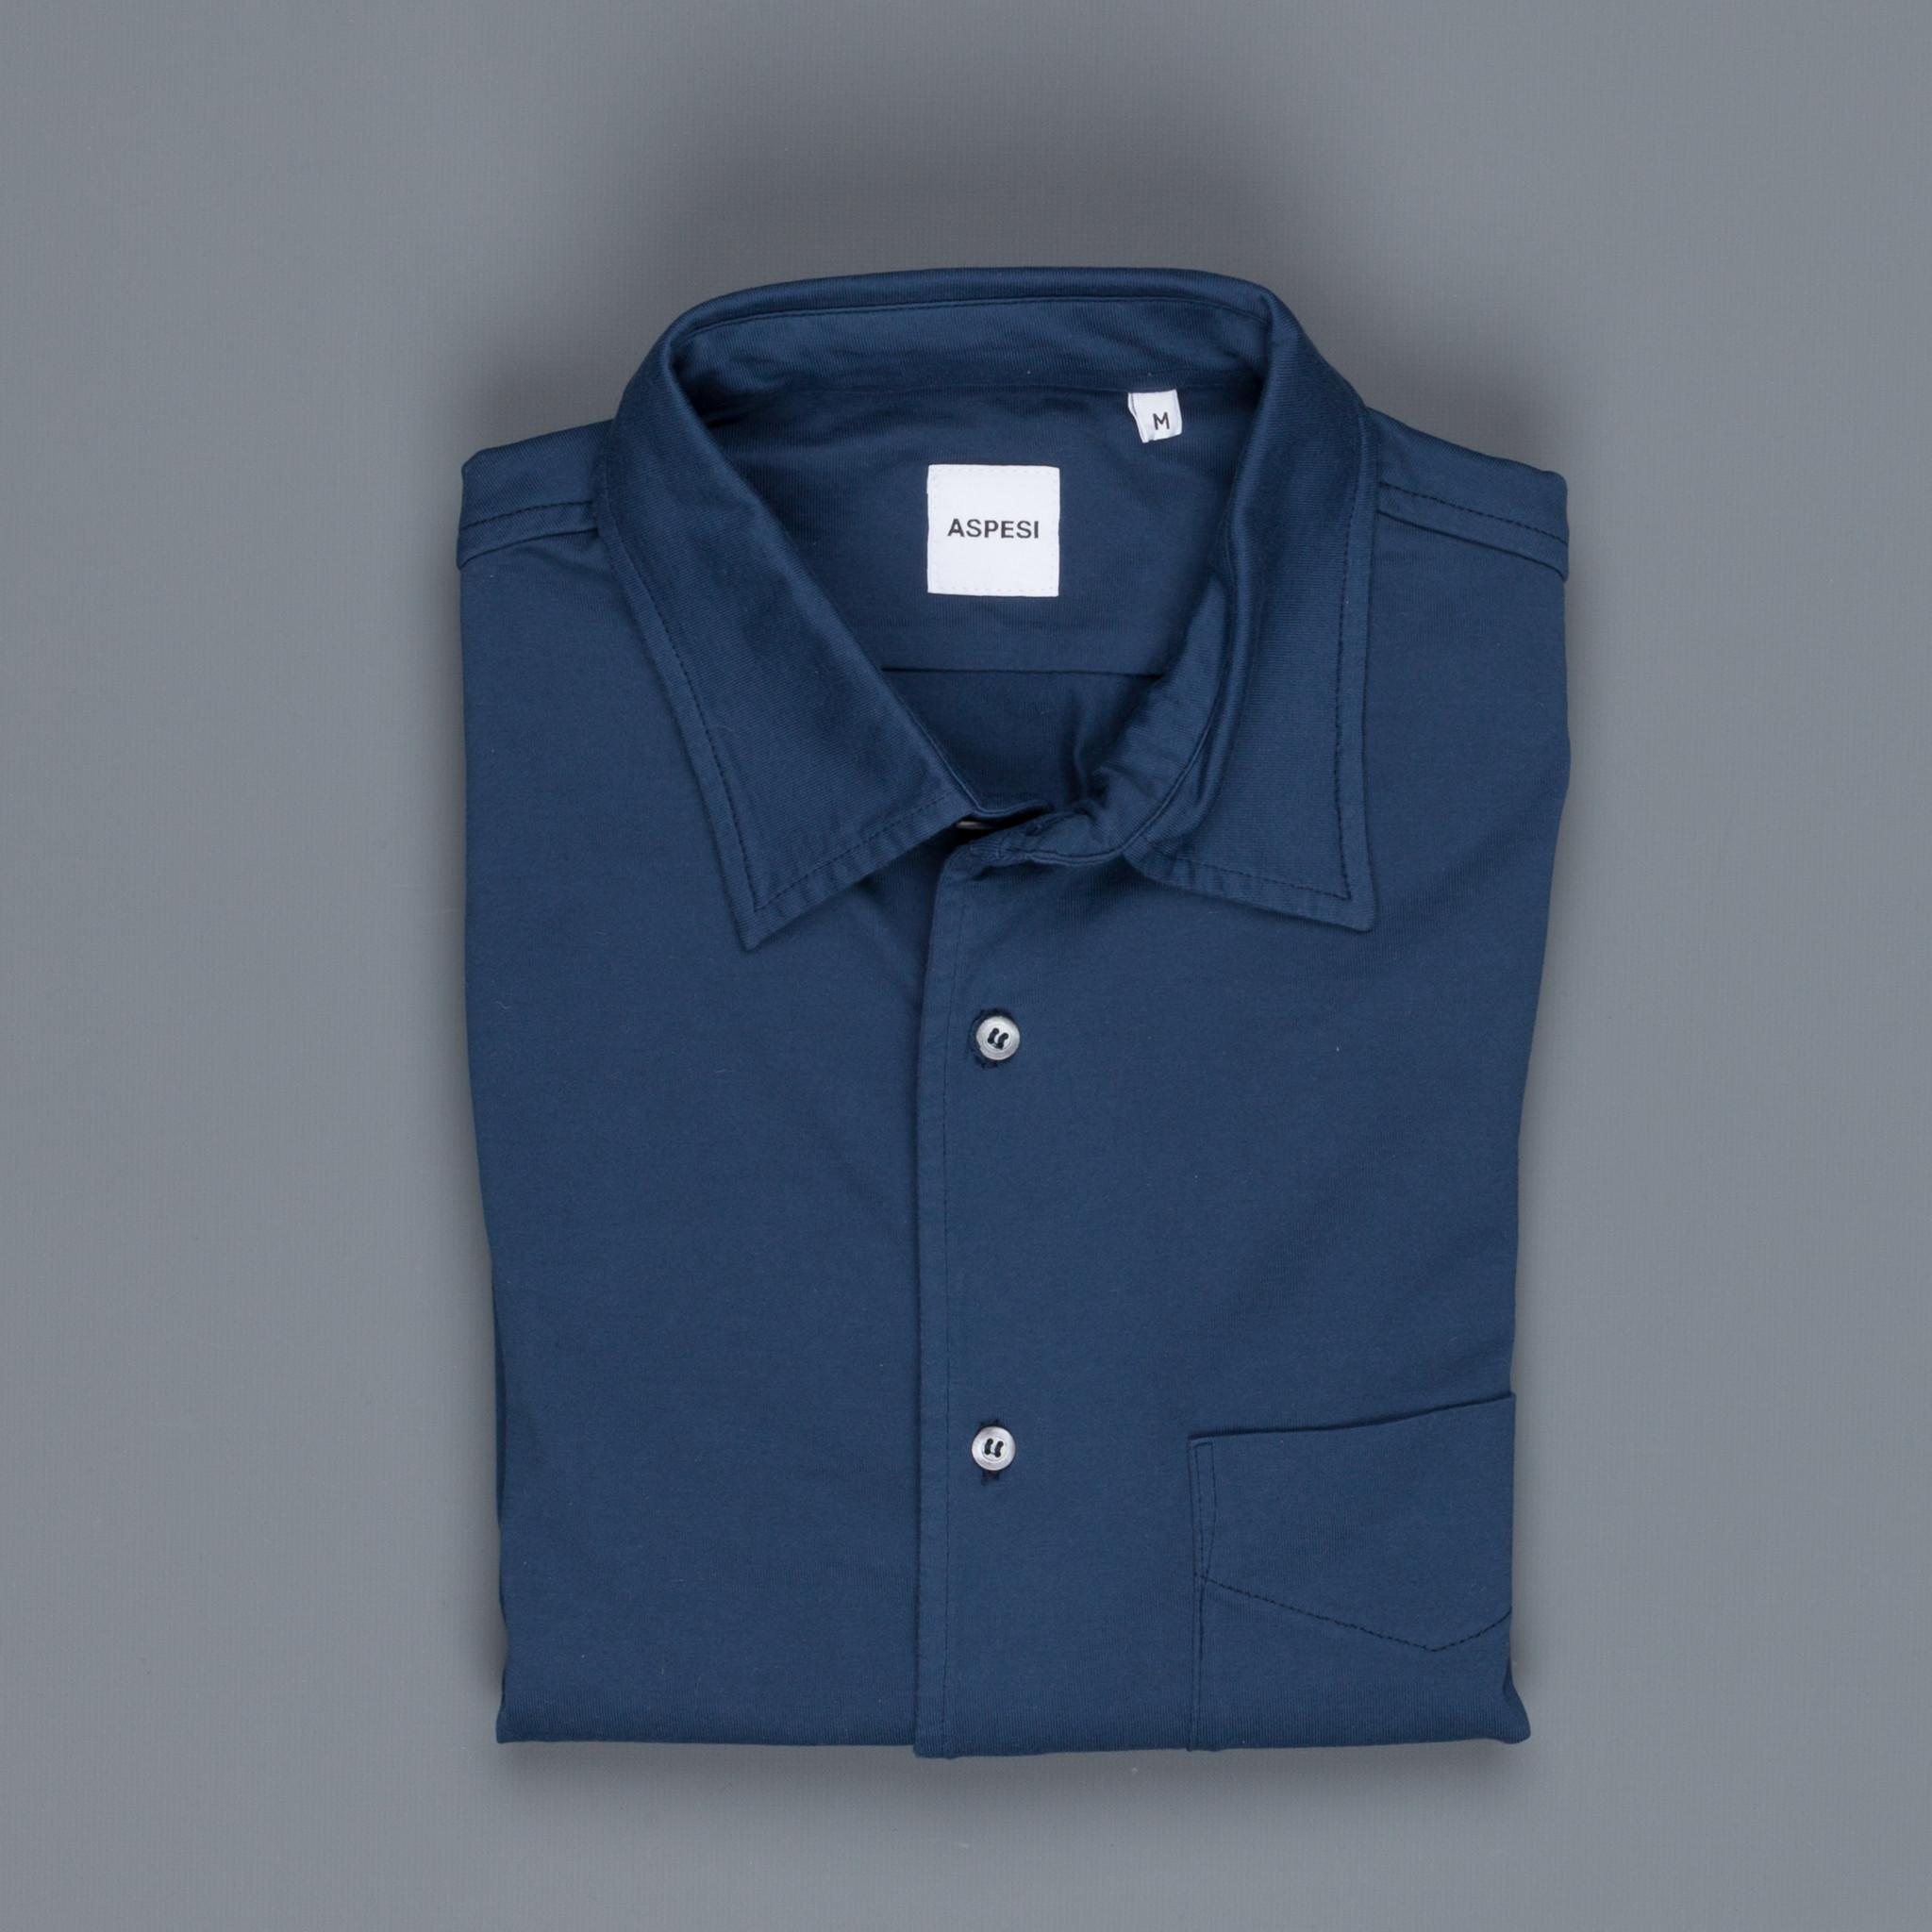 Aspesi chemise jersey 3.jpg